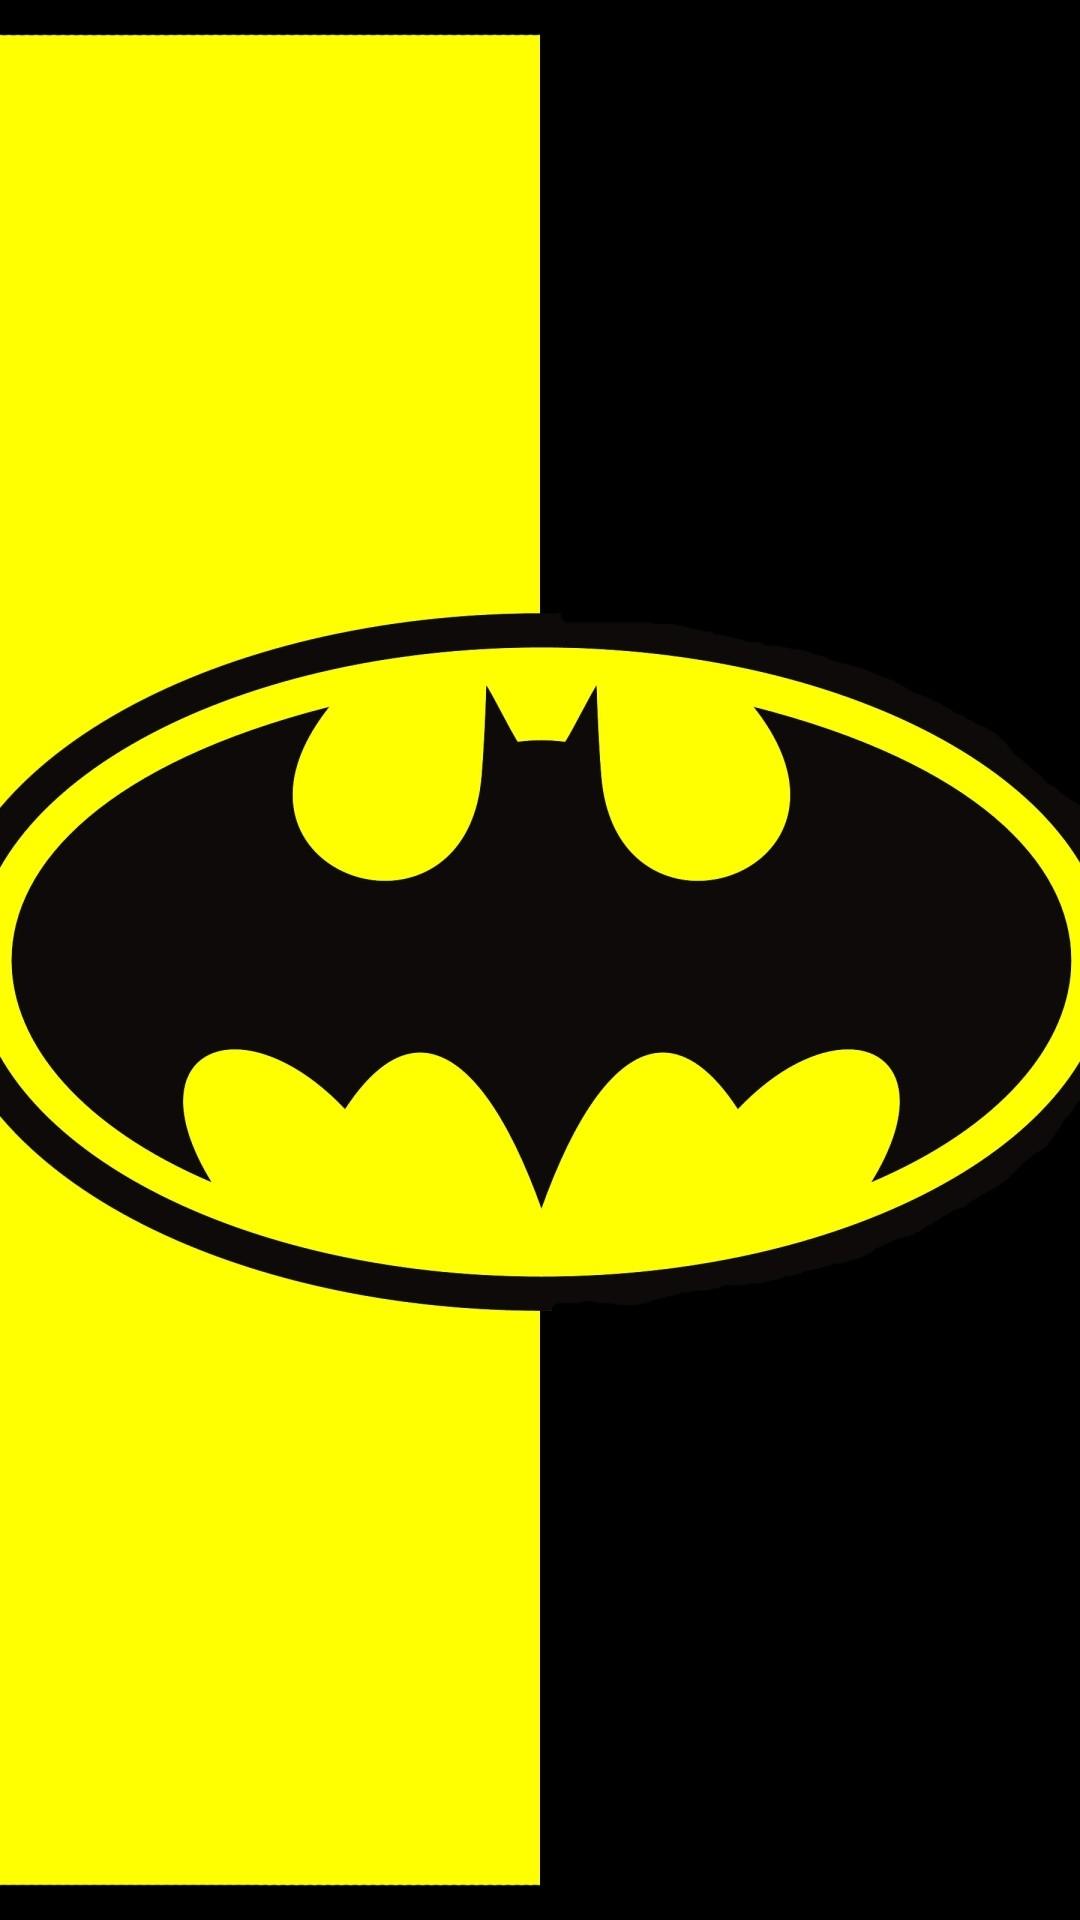 Batman HD Wallpaper for iPhone (74+ images)